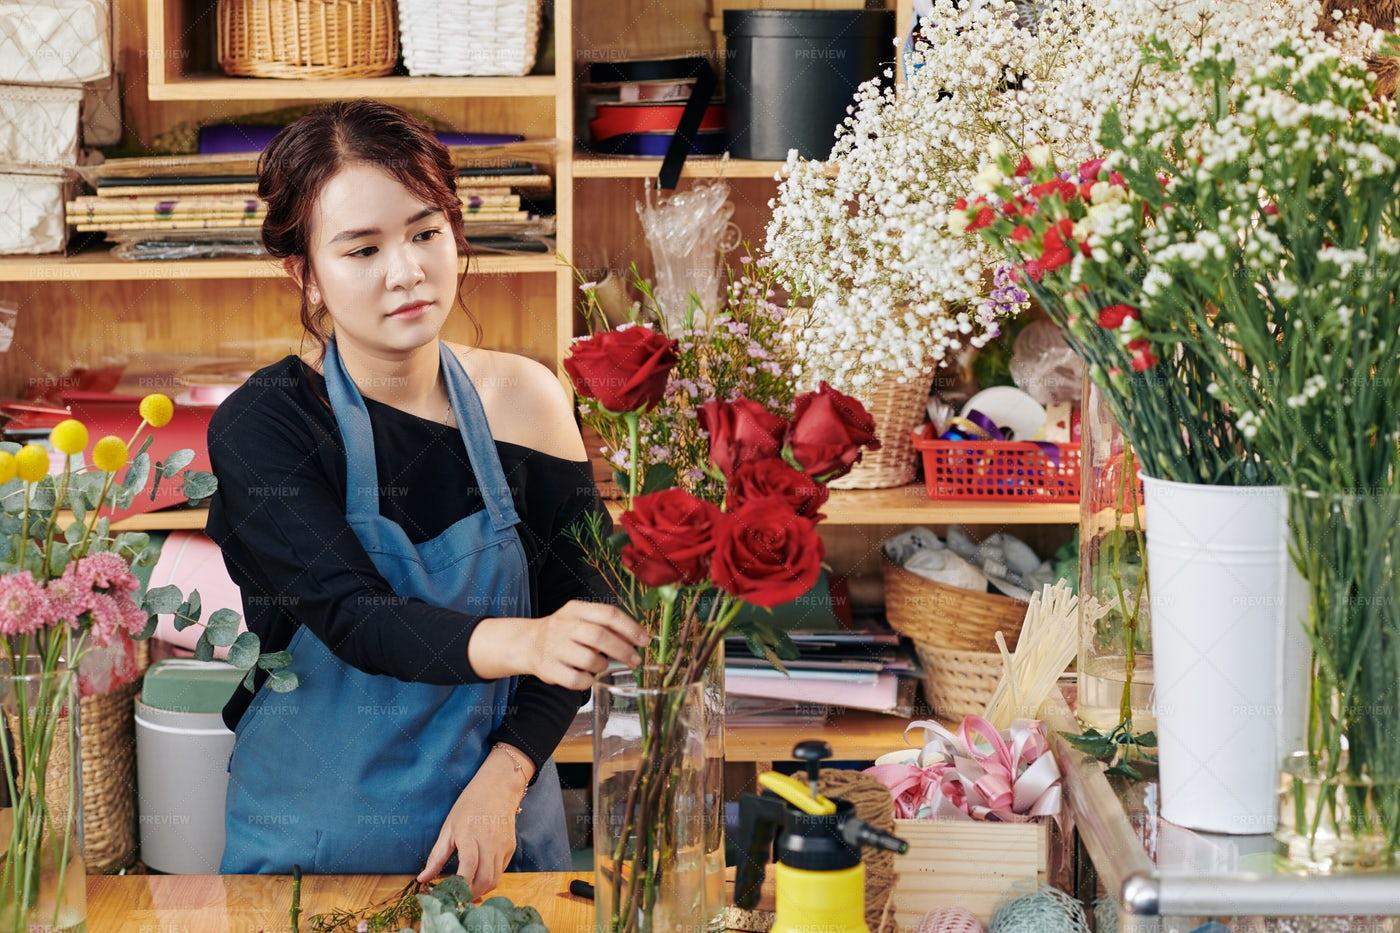 Florist Putting Flowers On Vase: Stock Photos